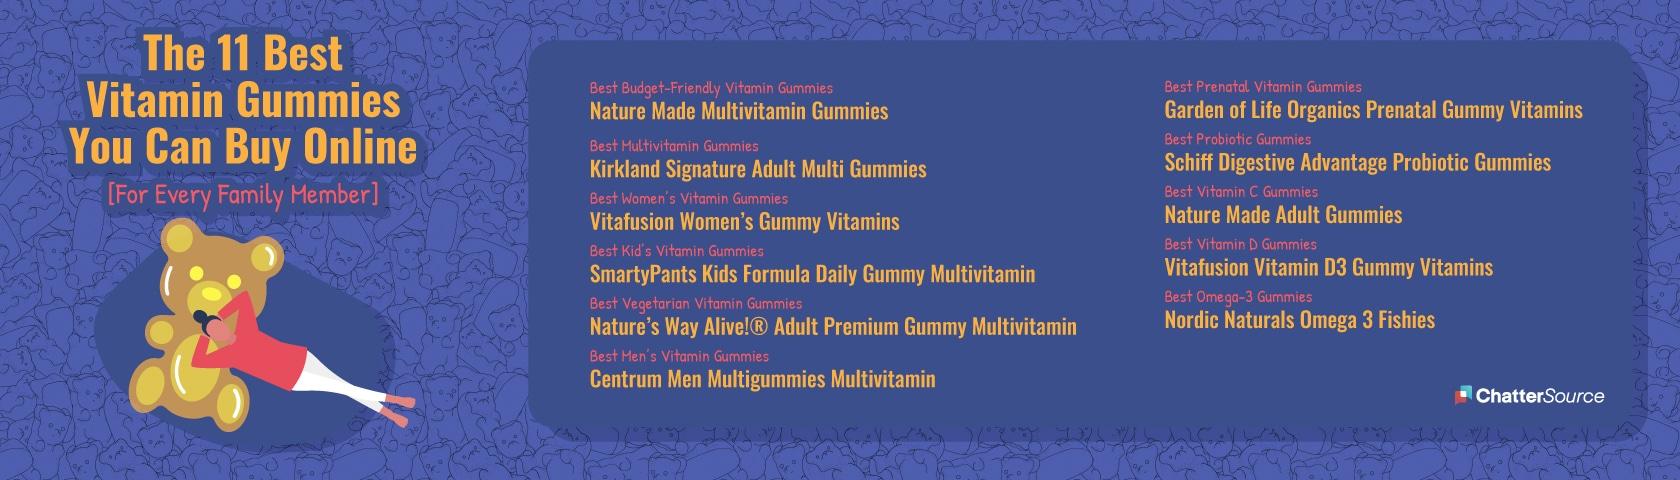 vitamin gummy infographic